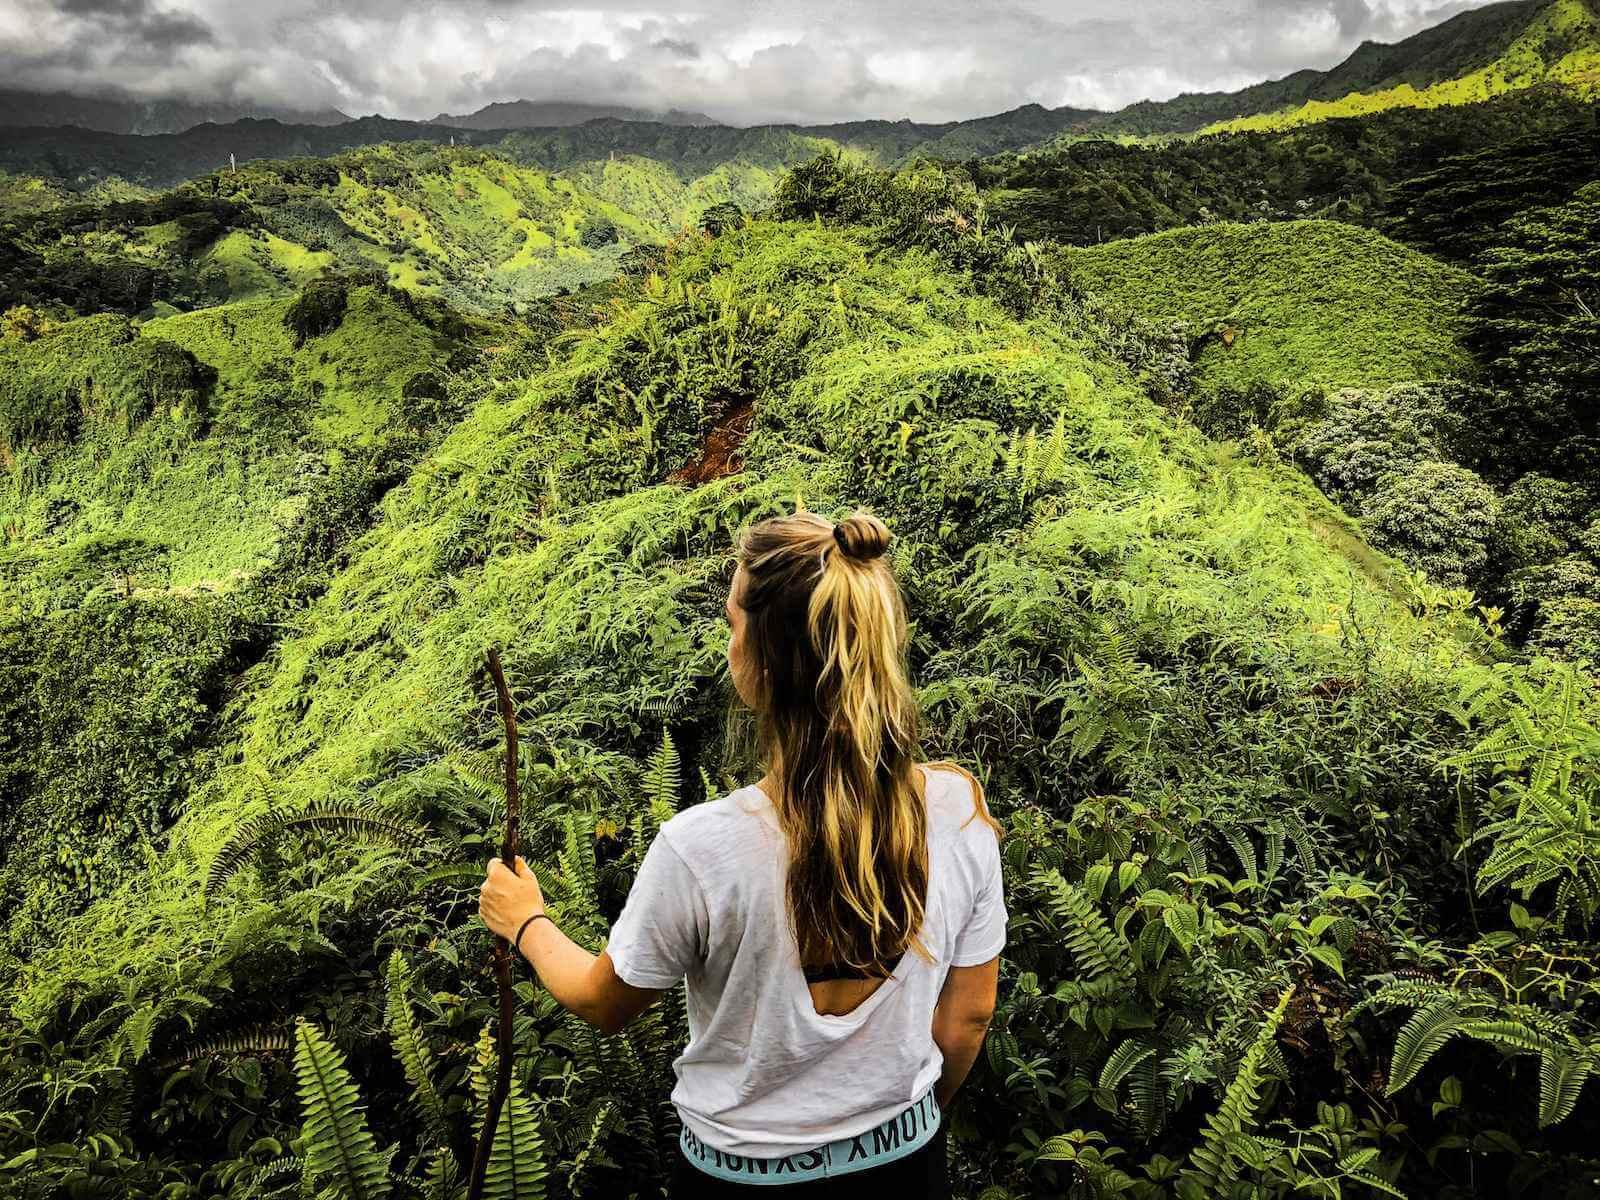 Kauai Kuilau Ridge Trail - Fantastische hike met schitterende uitzichten